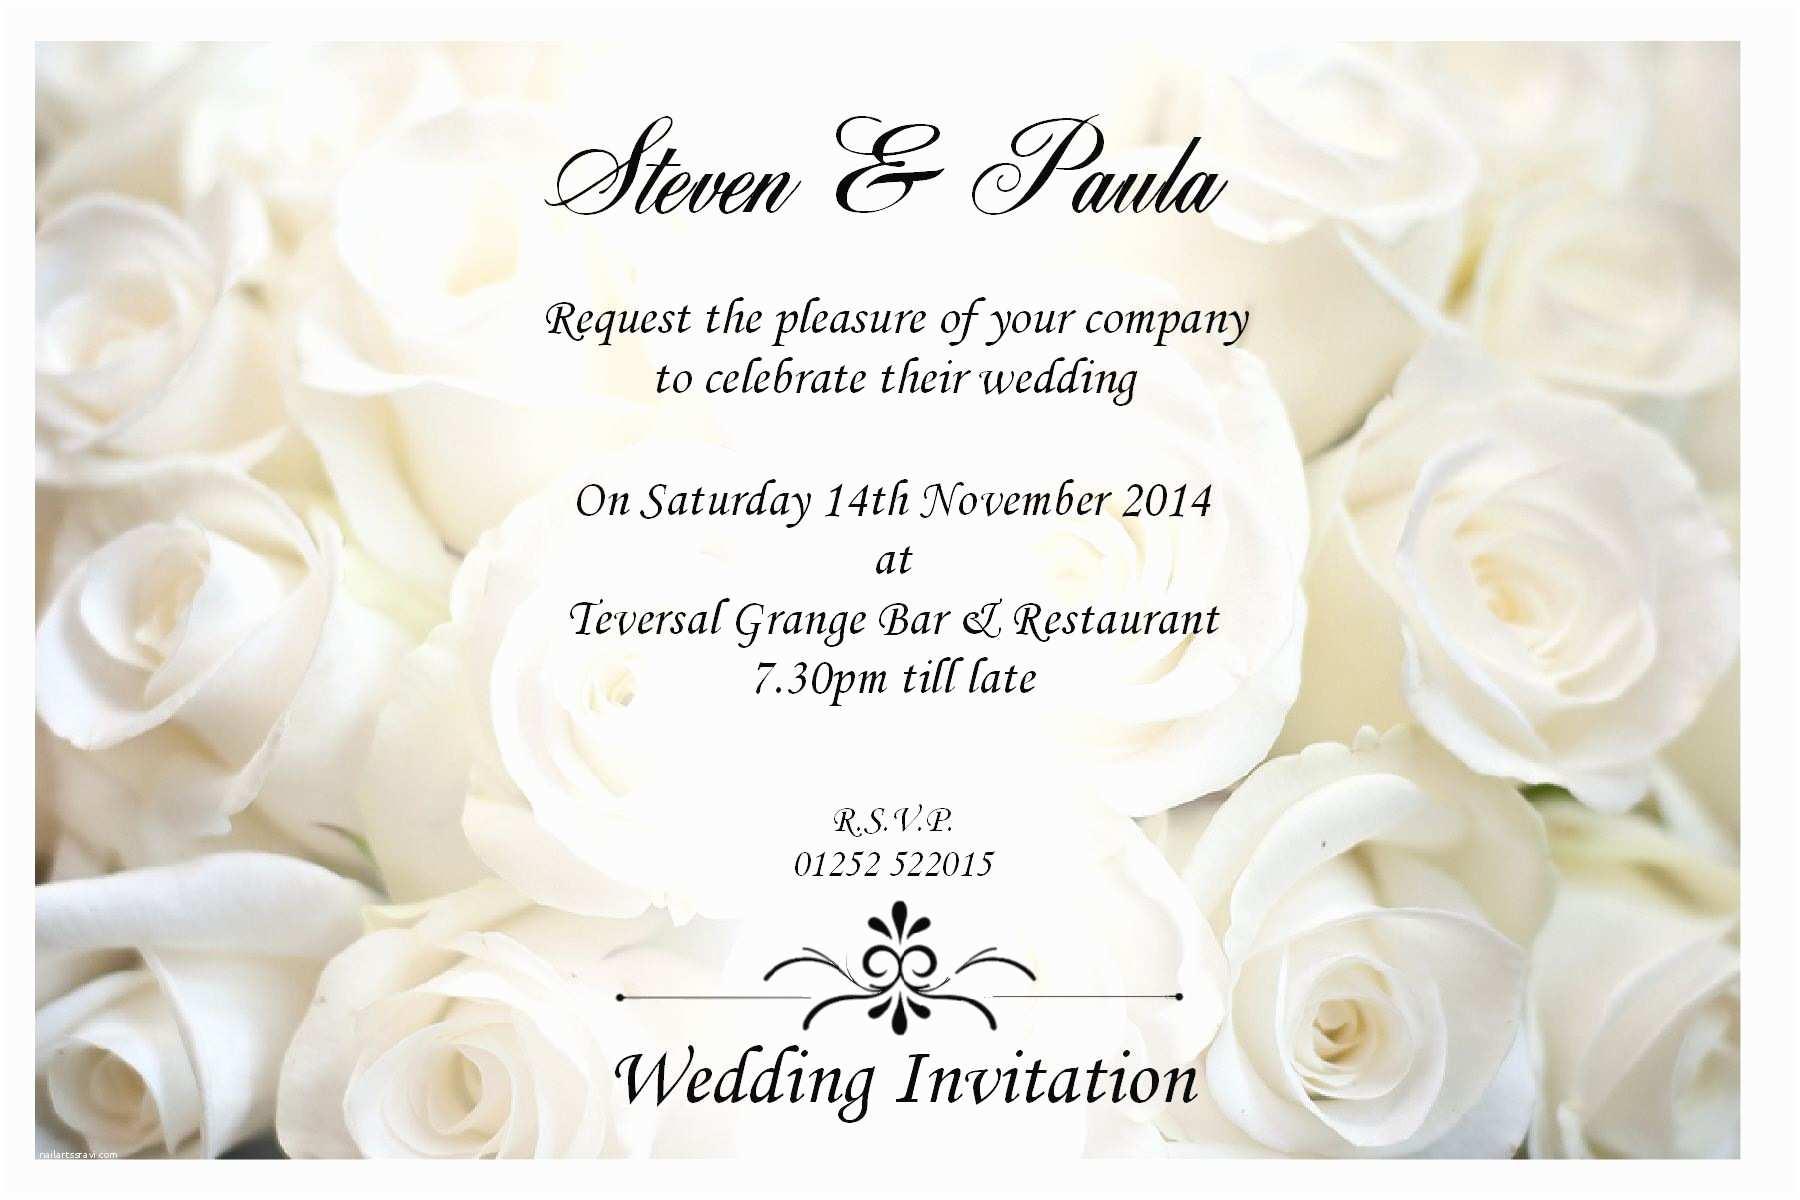 Sample Wedding Invitations Wedding Invitation Sample Wedding Invitation Card New